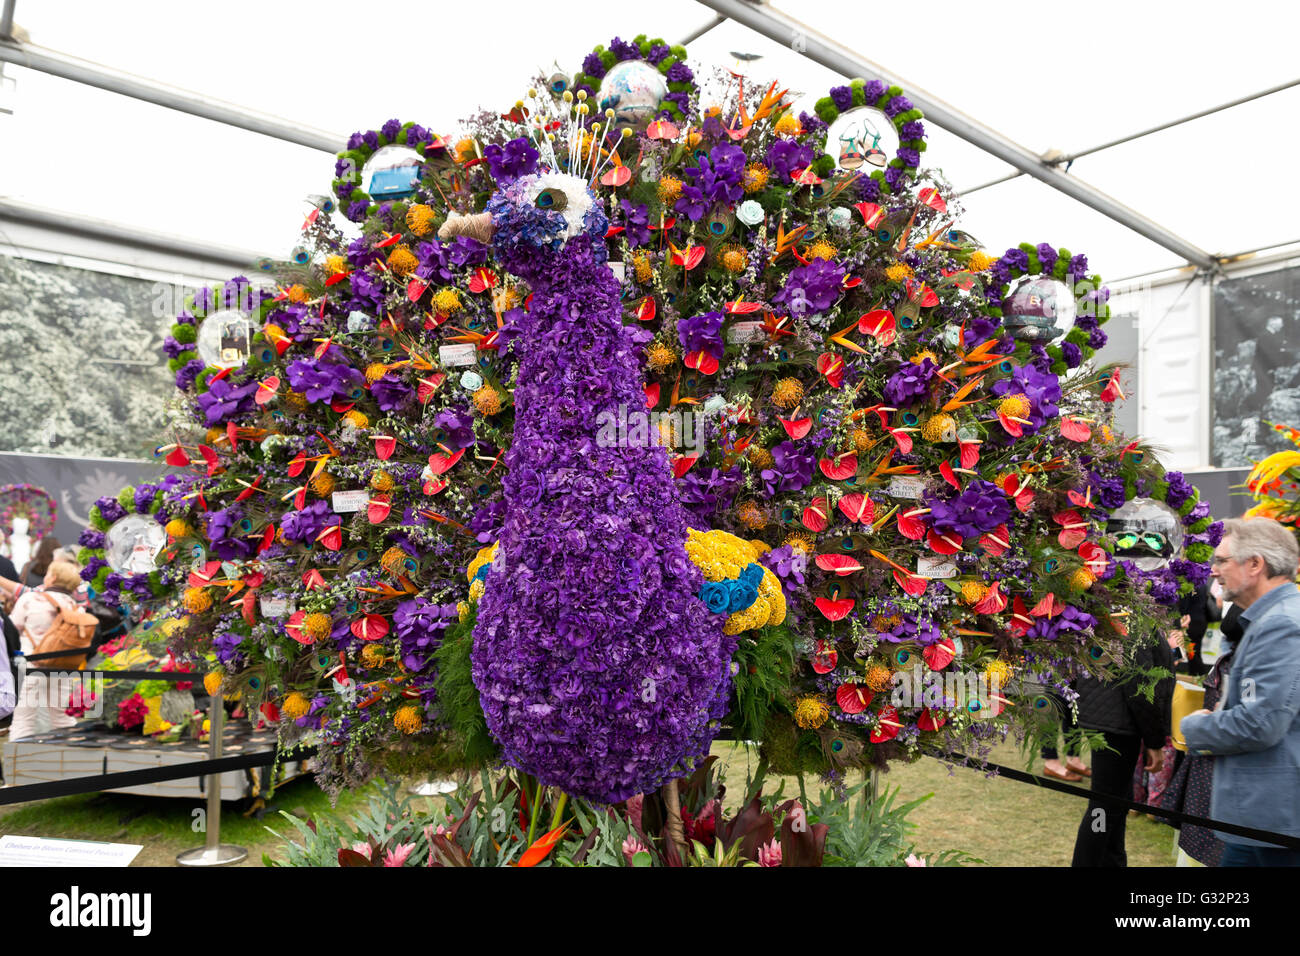 RHS Chelsea Flower Show 2016 großen Pavillon Blume Pfau Stockfoto